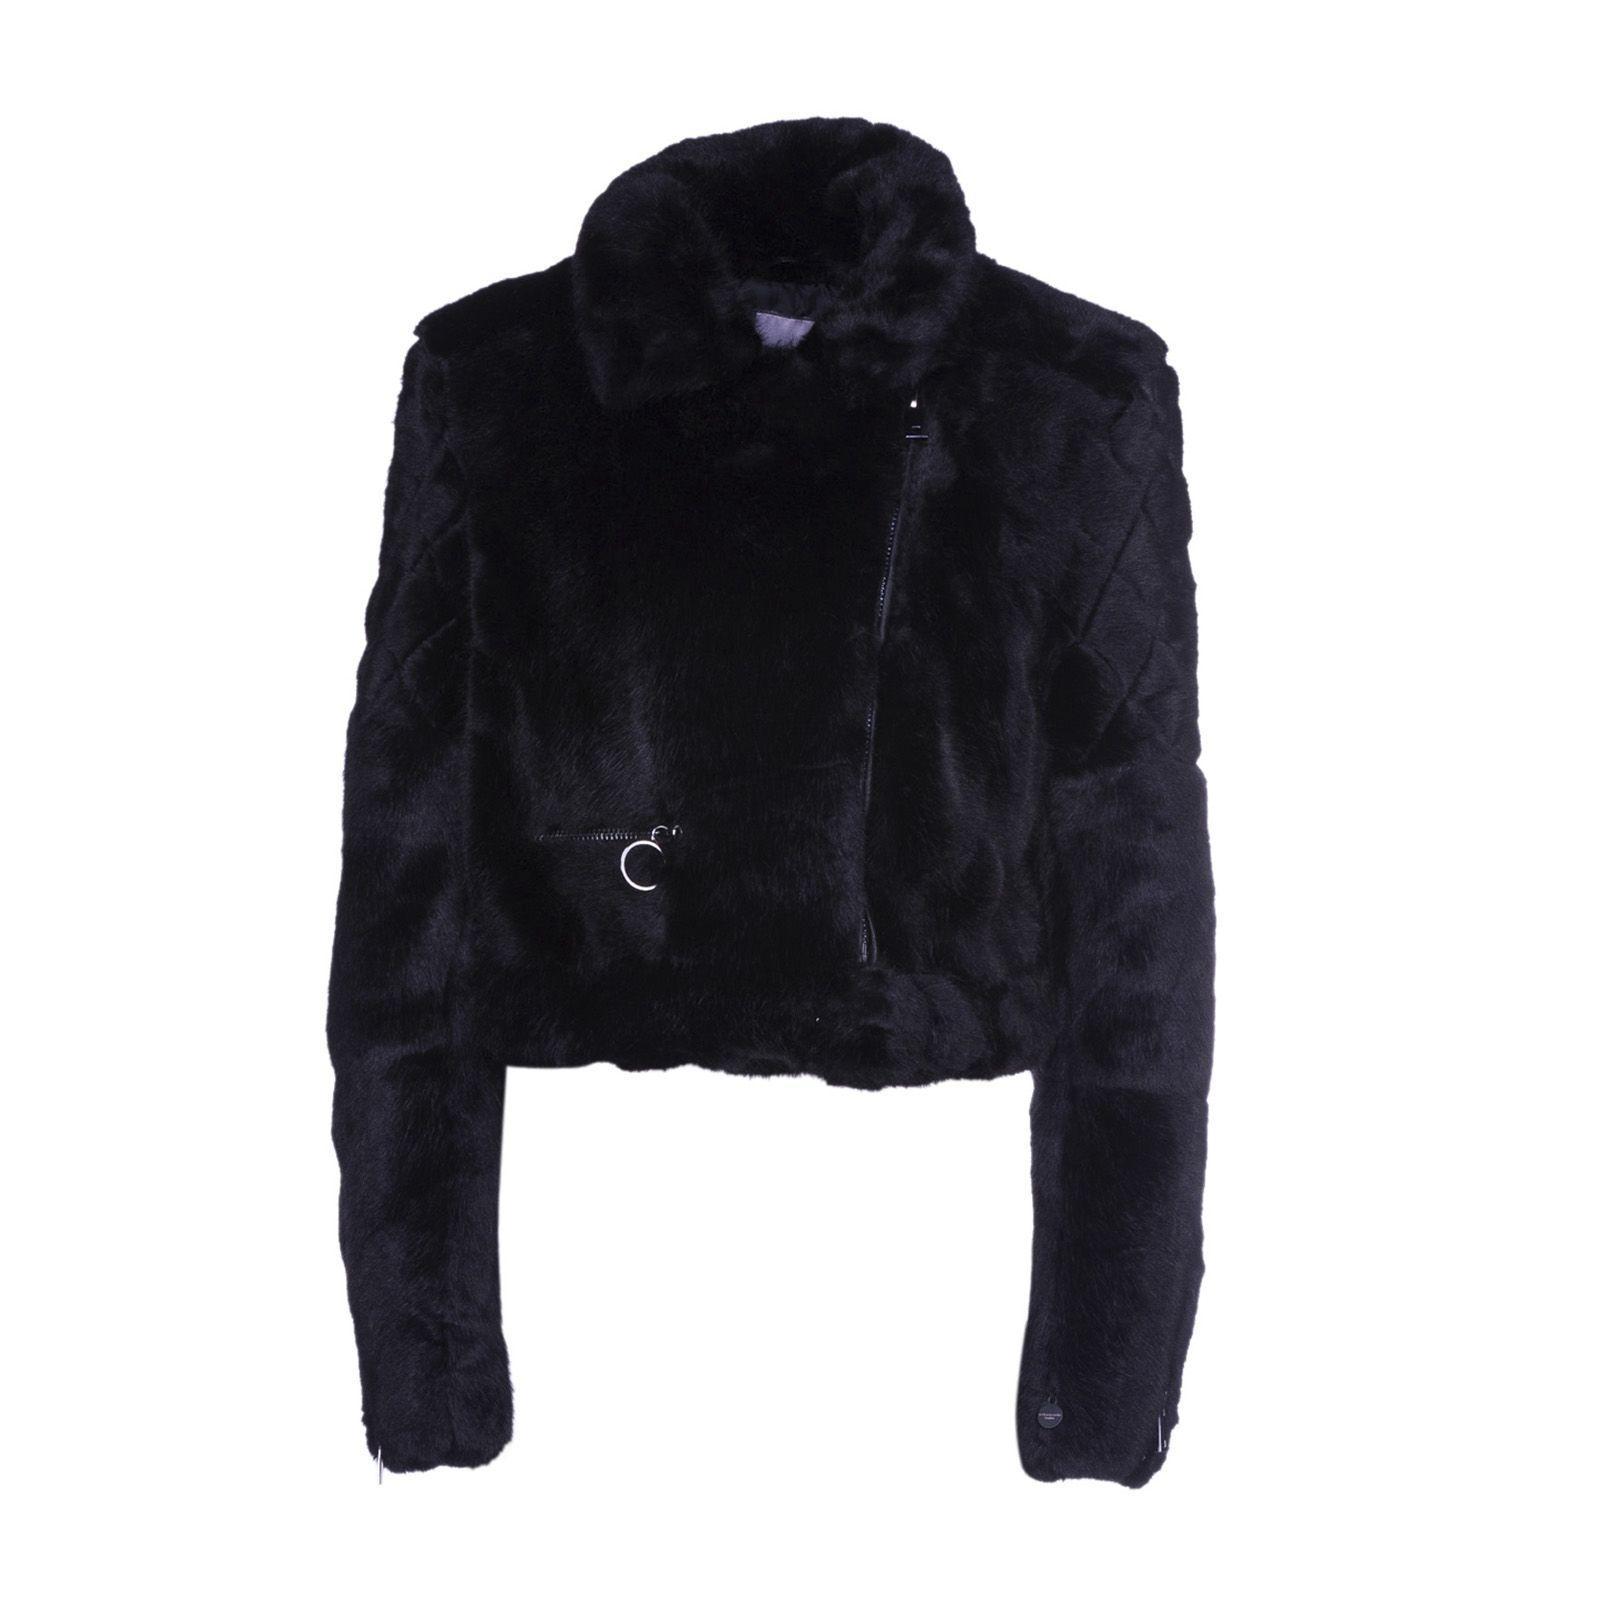 Urbancode Biker Jacket In Black